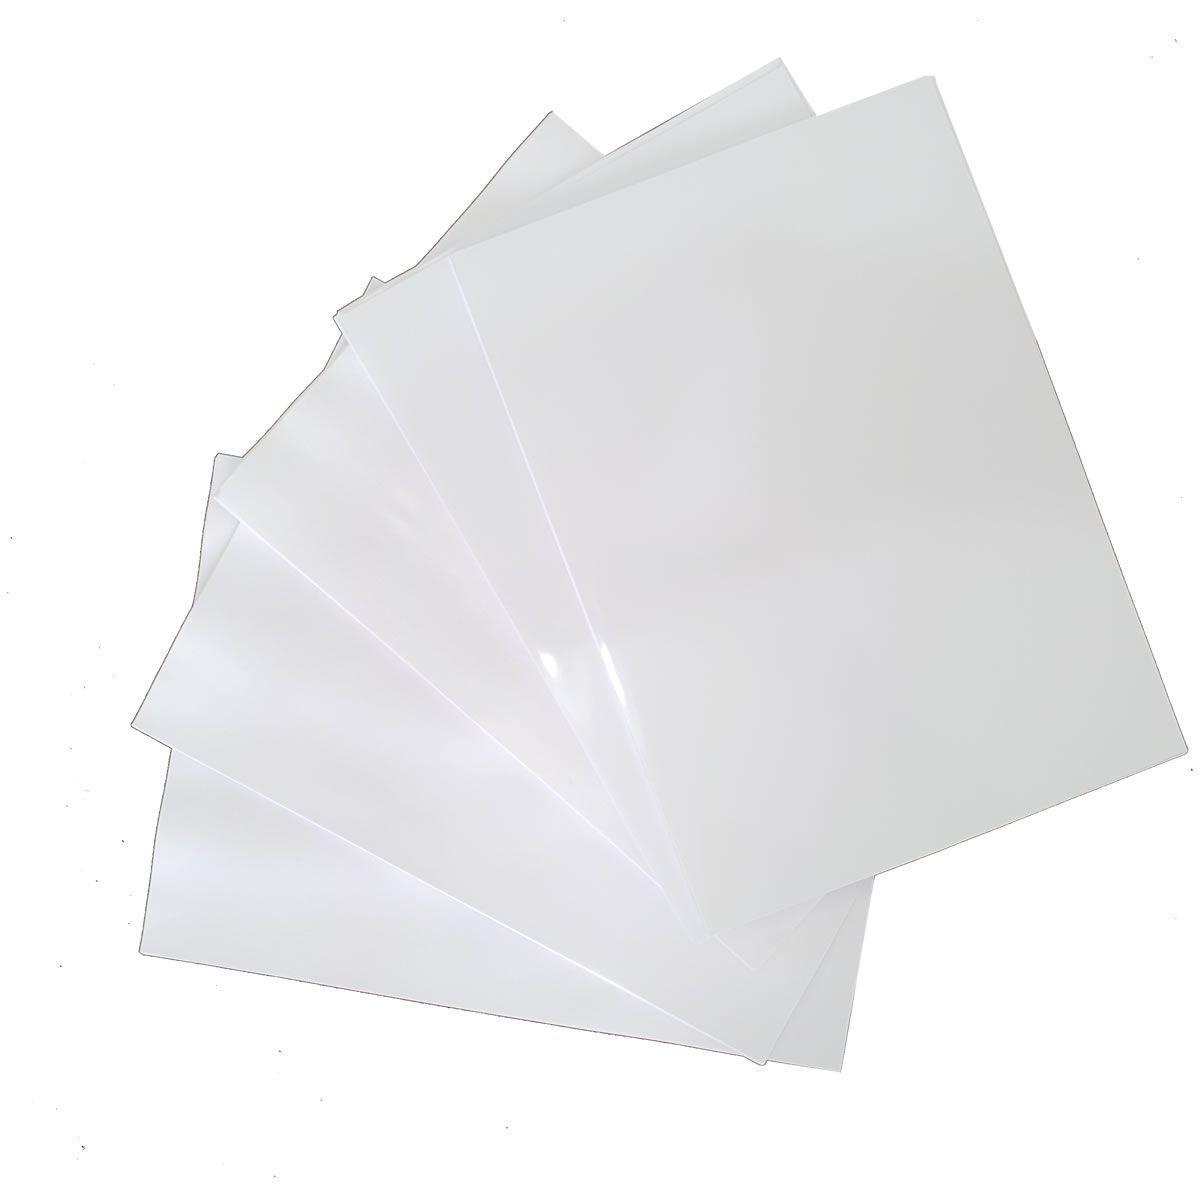 100 folhas Papel adesivo Branco 135g A4 Fotografico Glossy Evolut